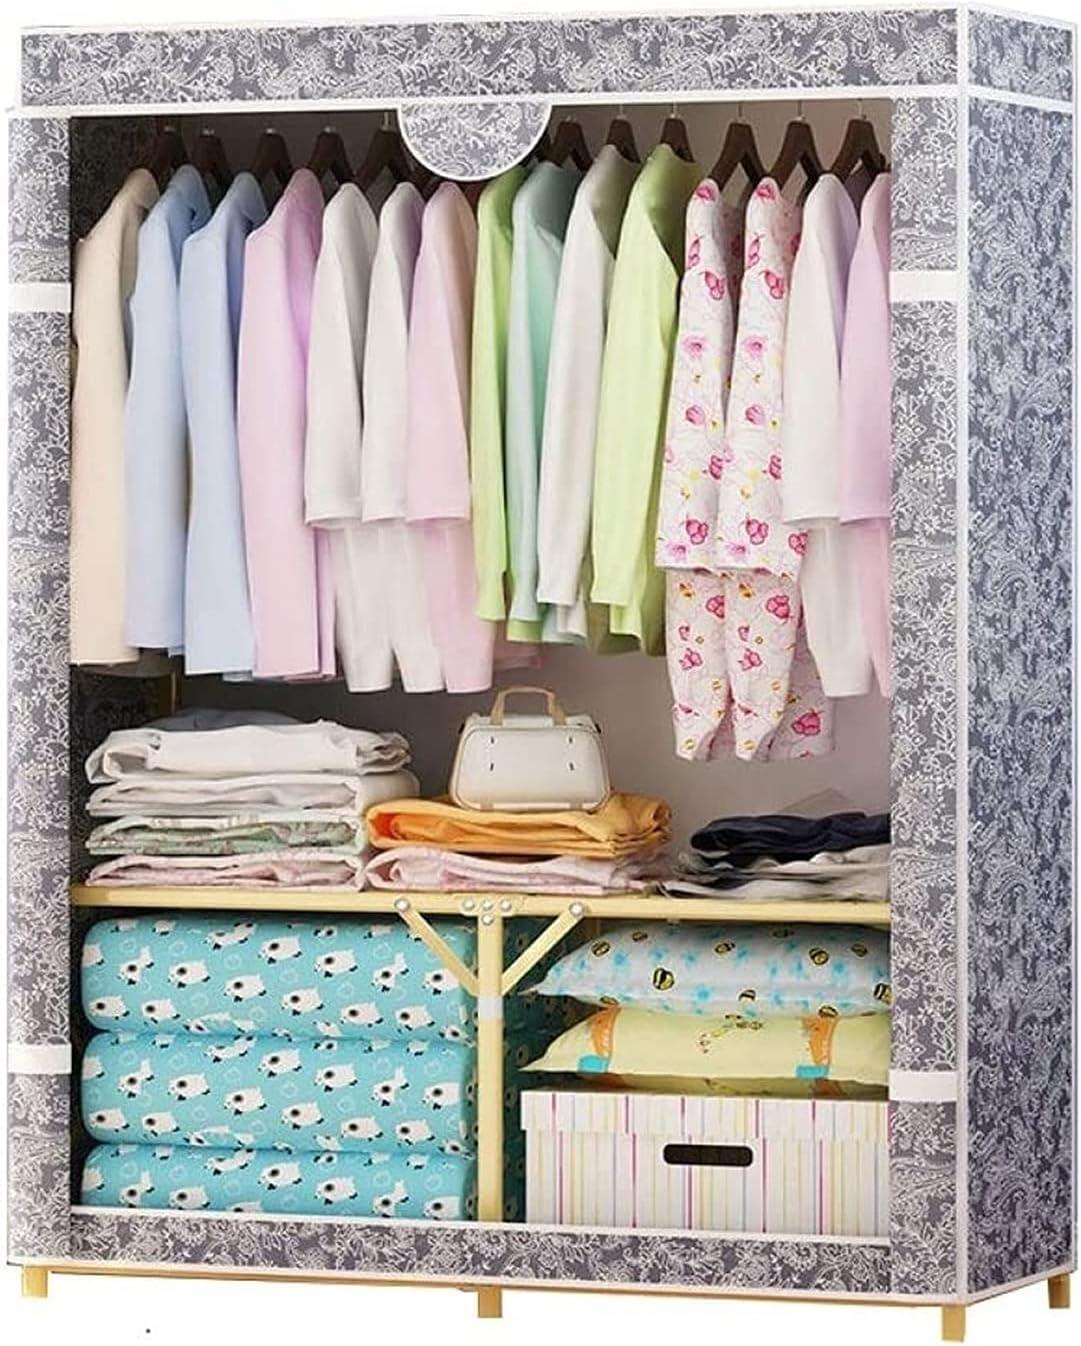 ZZYE Manufacturer regenerated Houston Mall product Wardrobe Closet Foldable Portable Clothes